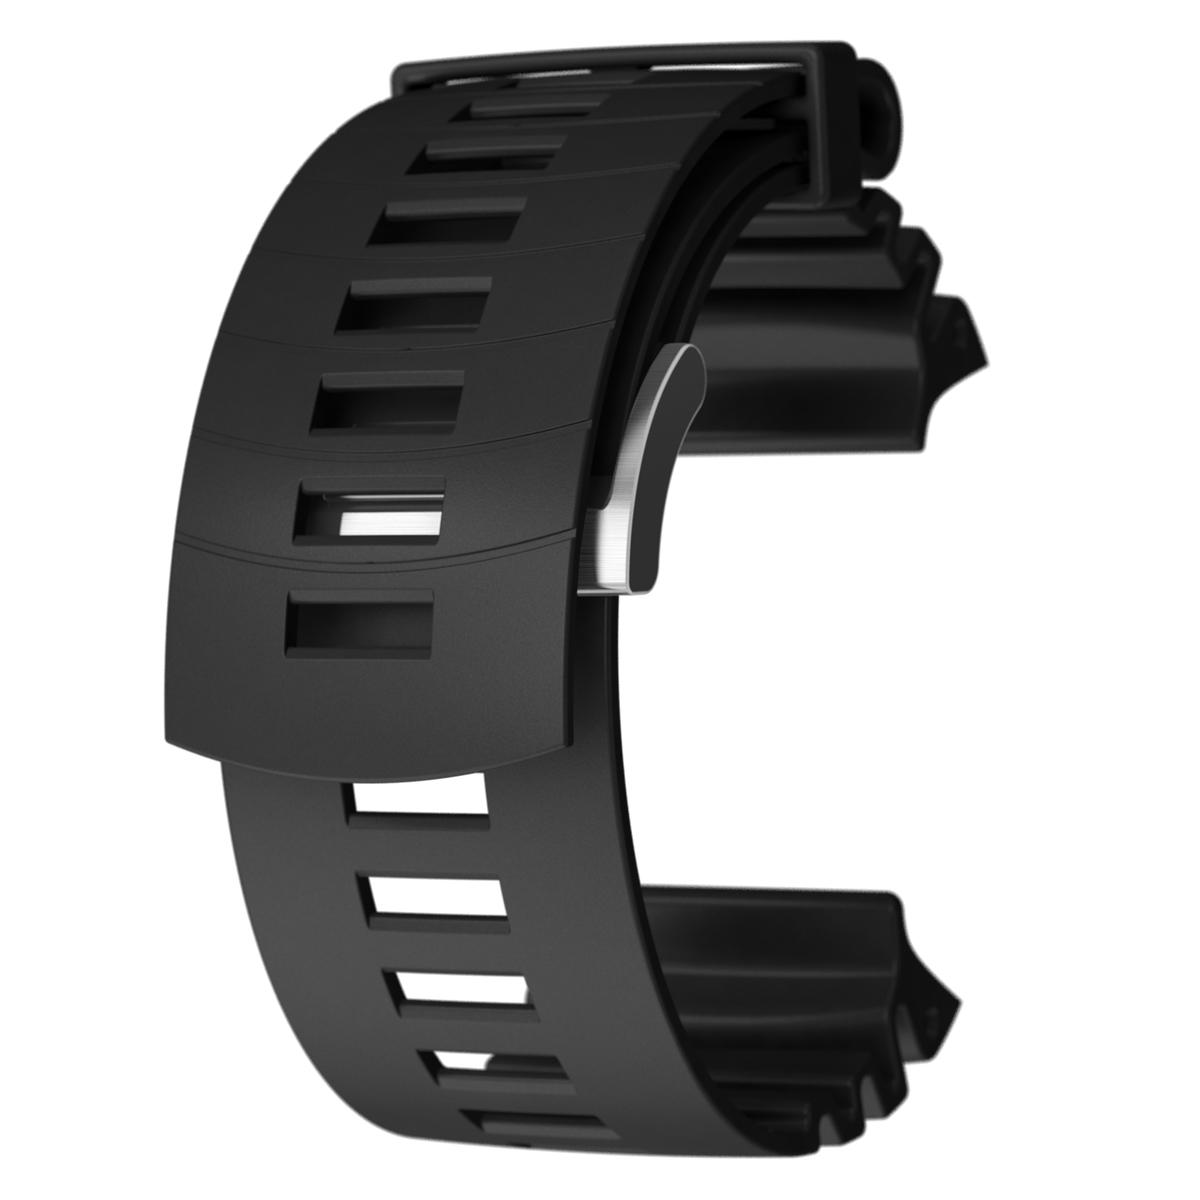 SUUNTO - EON Steel Armband Set